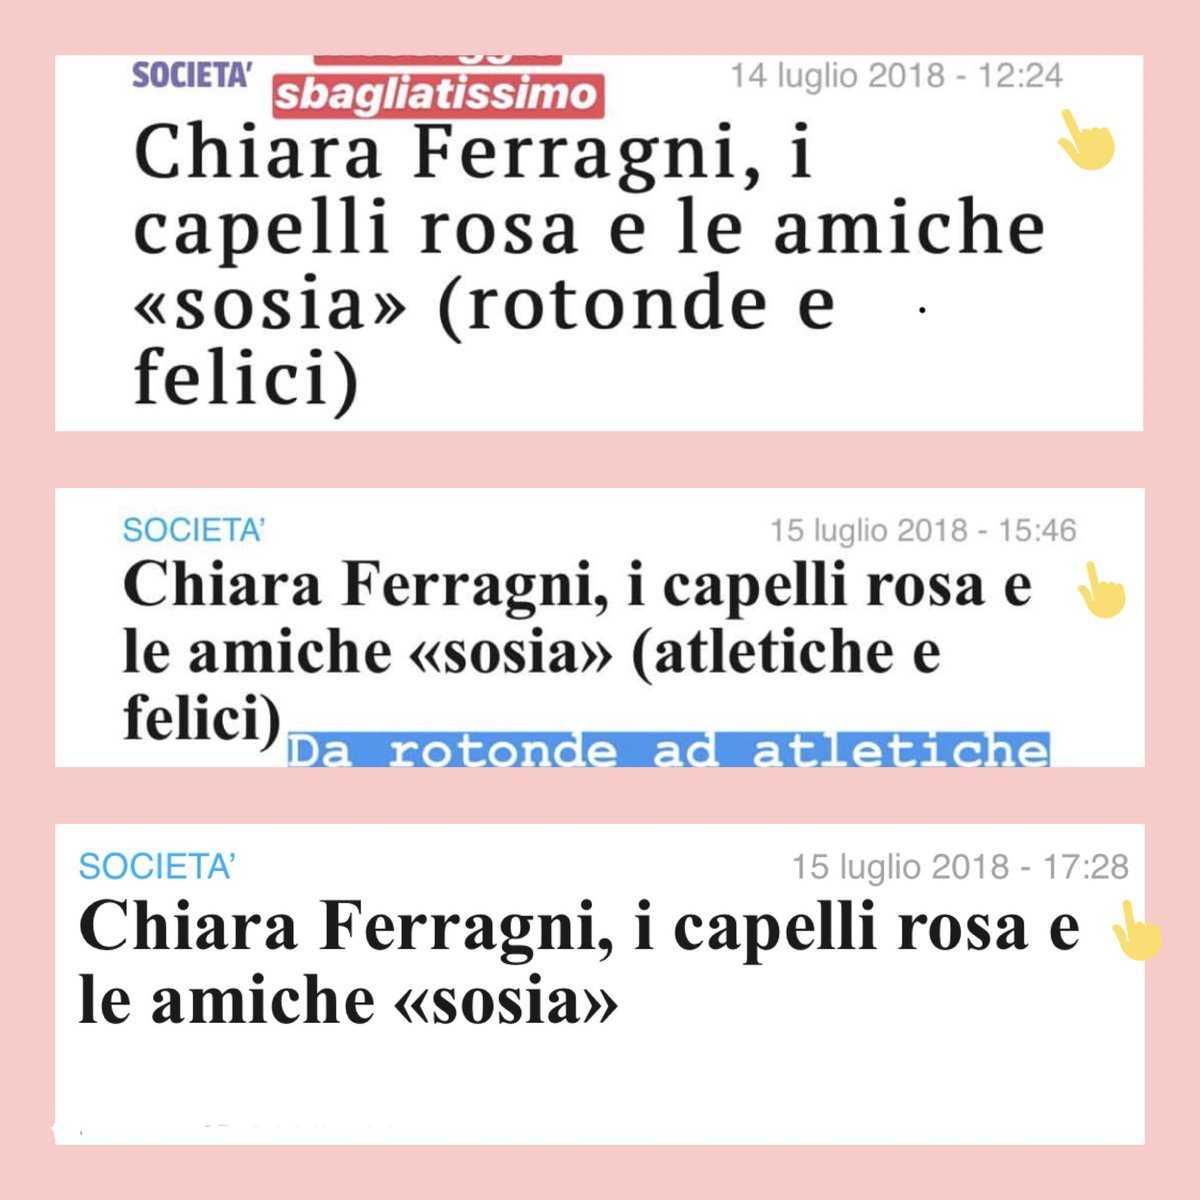 Chiara Ferragni Corriere Vari Titoli